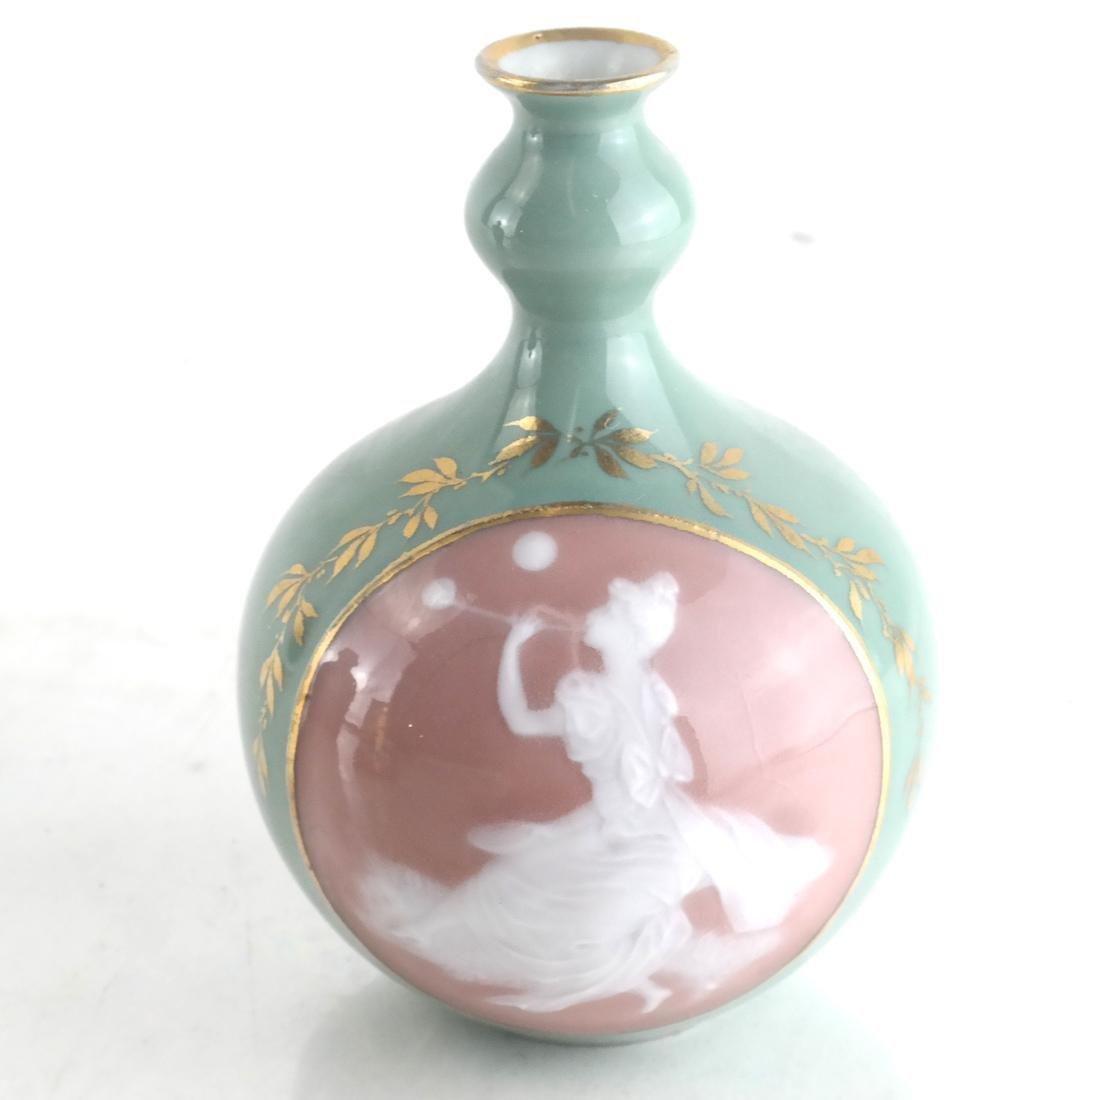 Three Decorated Porcelain Bud Vases - 2